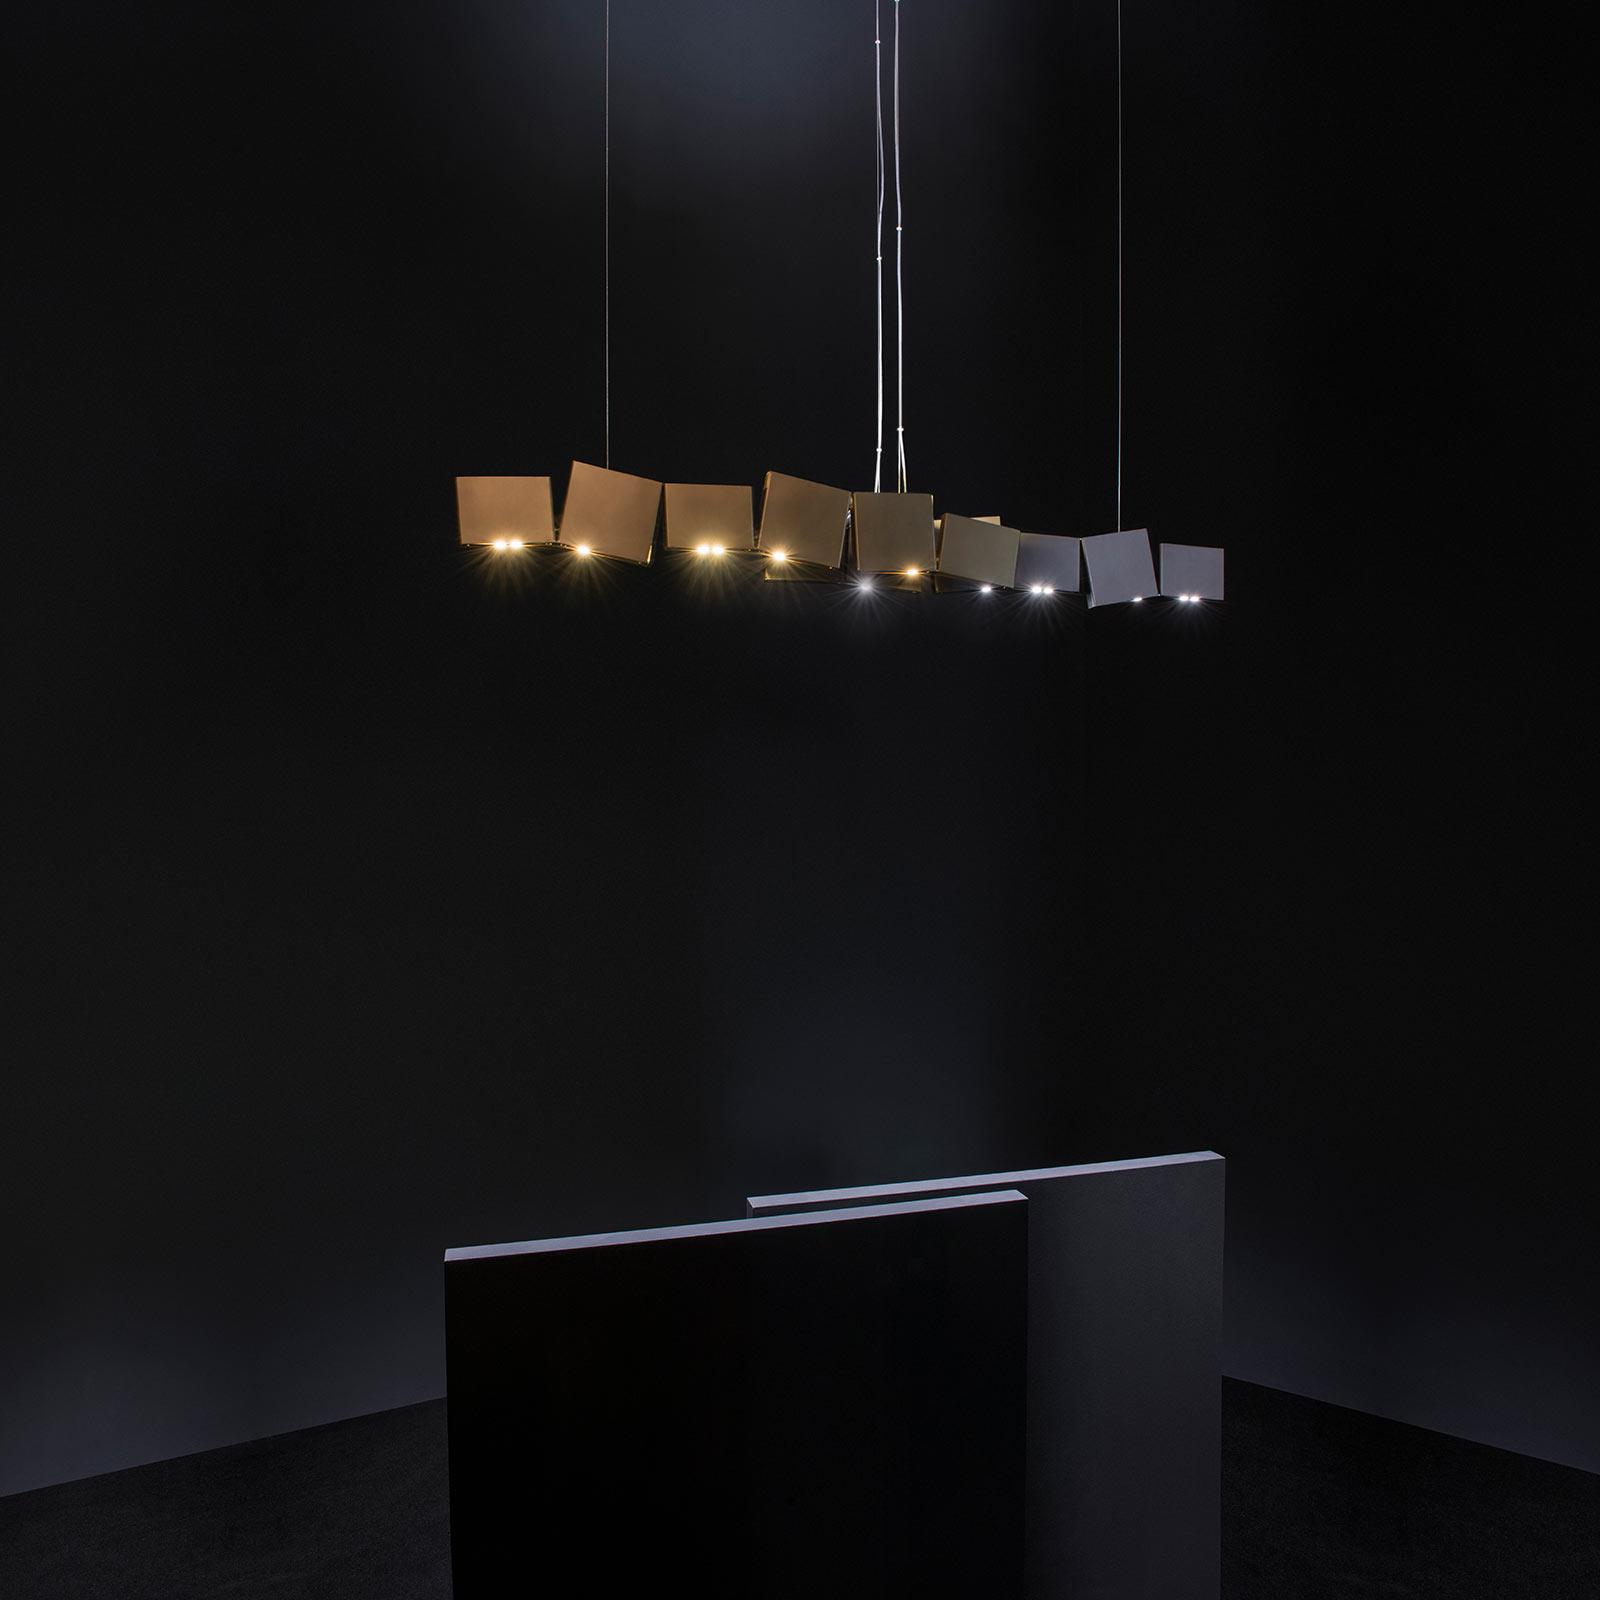 Terzani Gaia lampa wisząca LED 24-punktowa